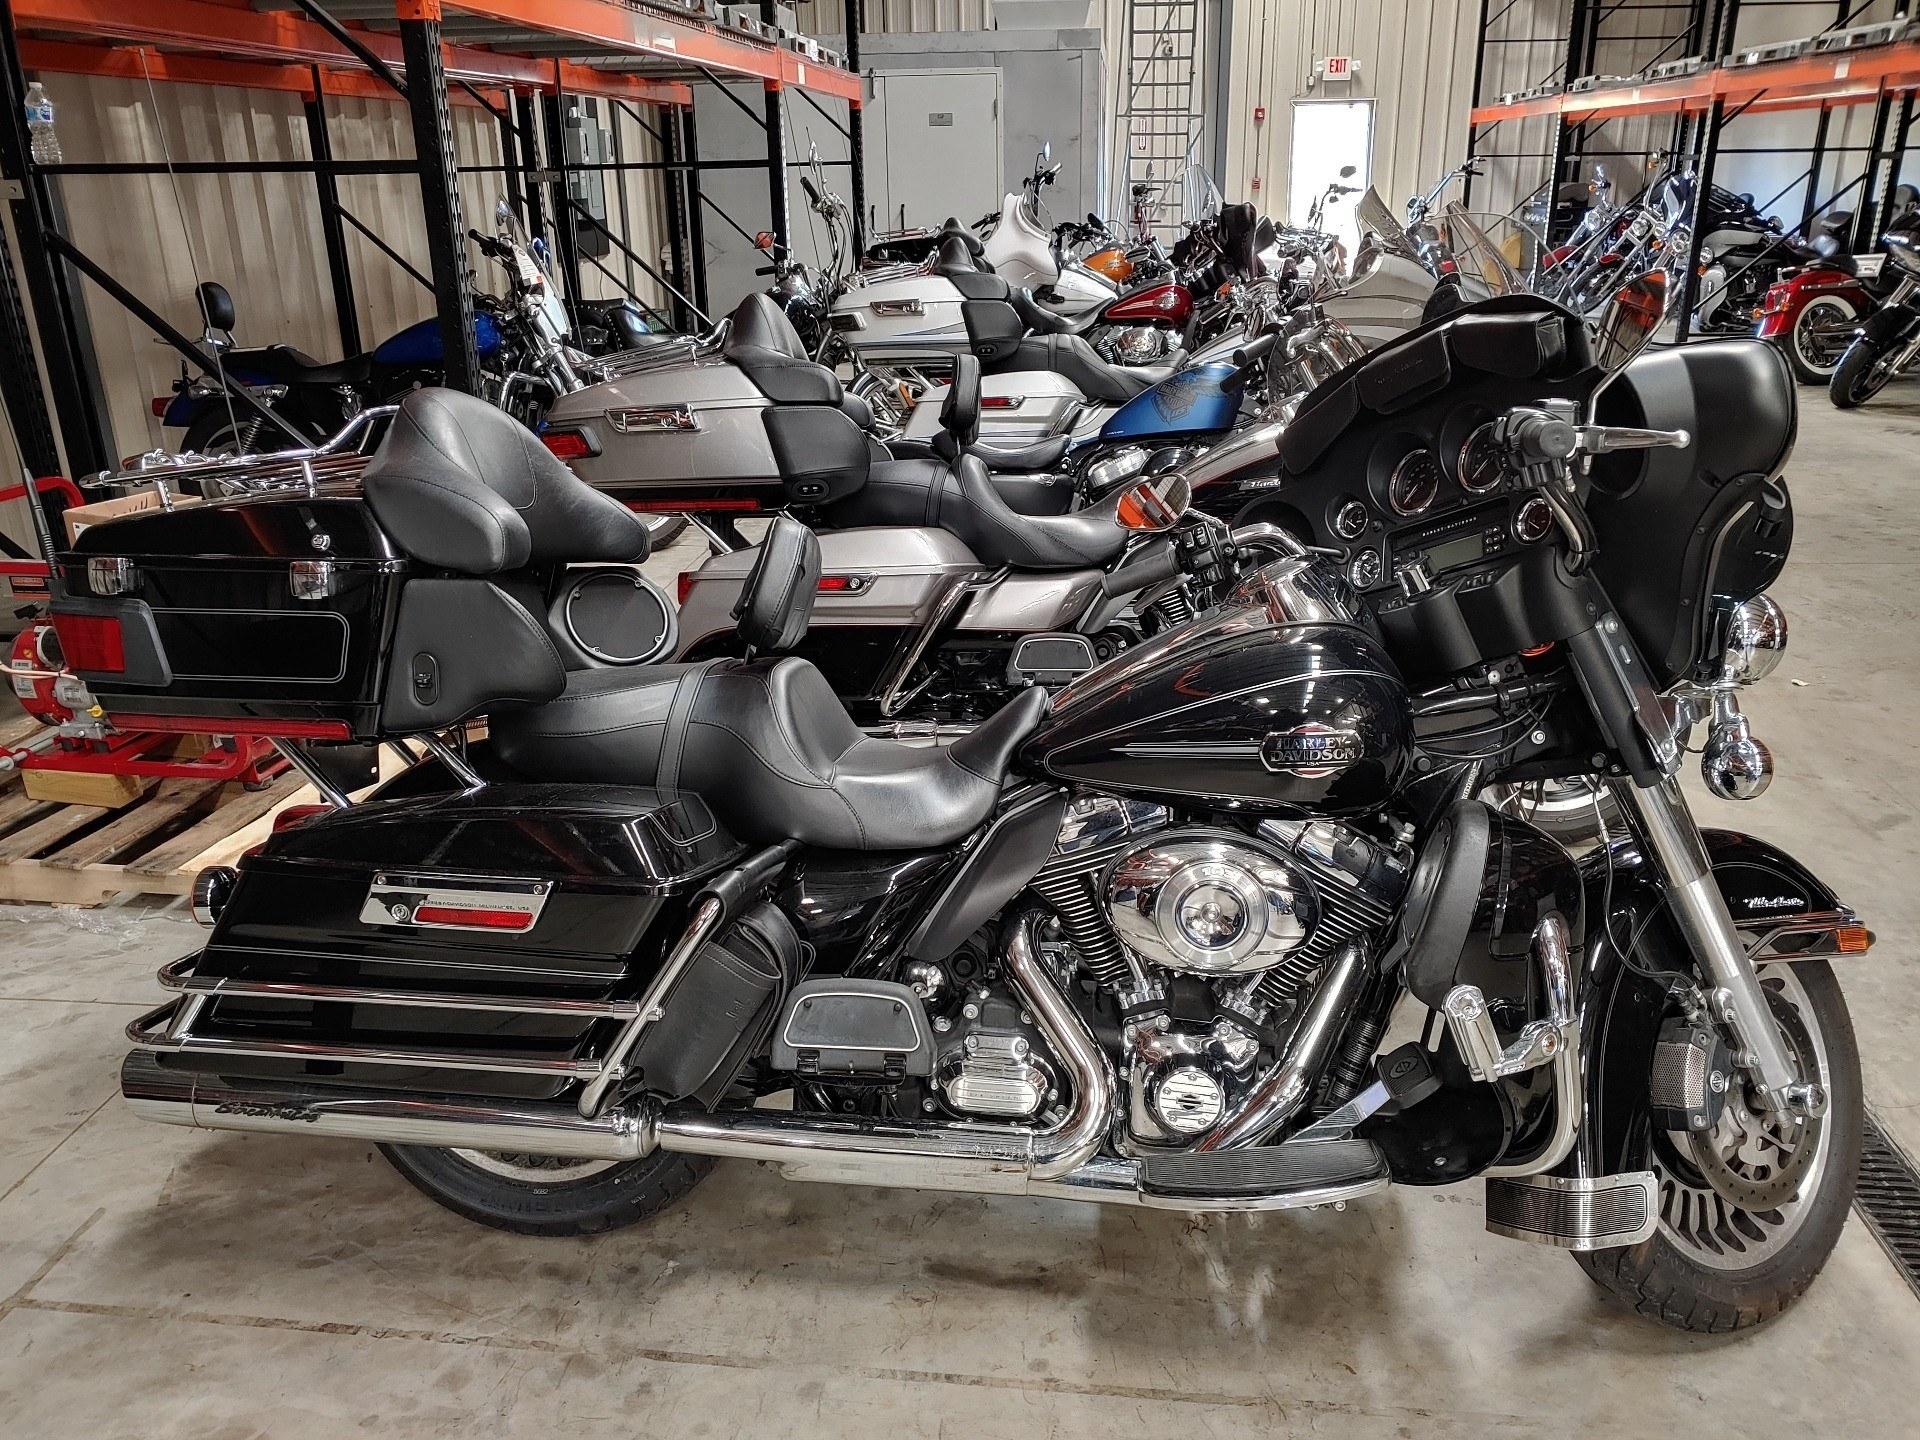 Used 2013 Harley Davidson Ultra Classic Electra Glide Vivid Black Motorcycles In Broadalbin Ny B9198p